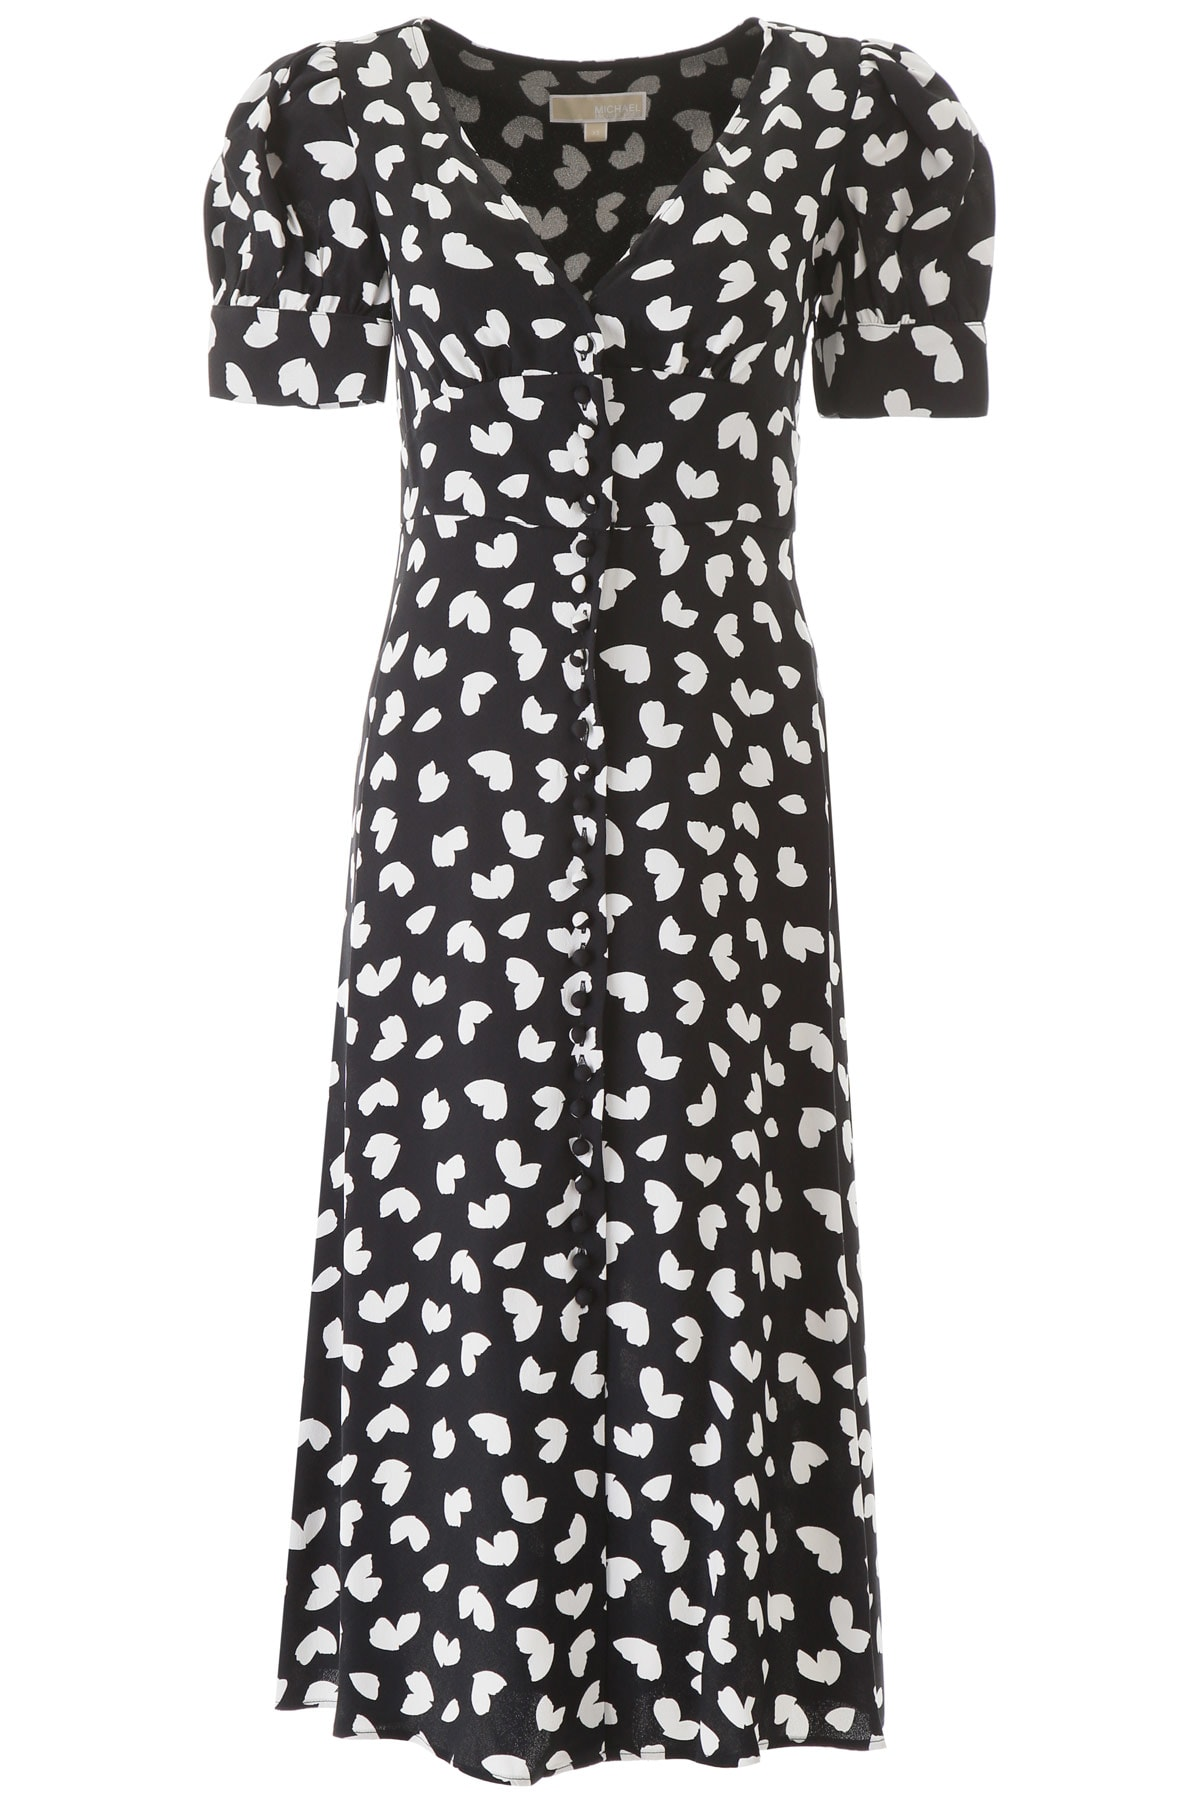 Buy MICHAEL Michael Kors Petal Print Dress online, shop MICHAEL Michael Kors with free shipping